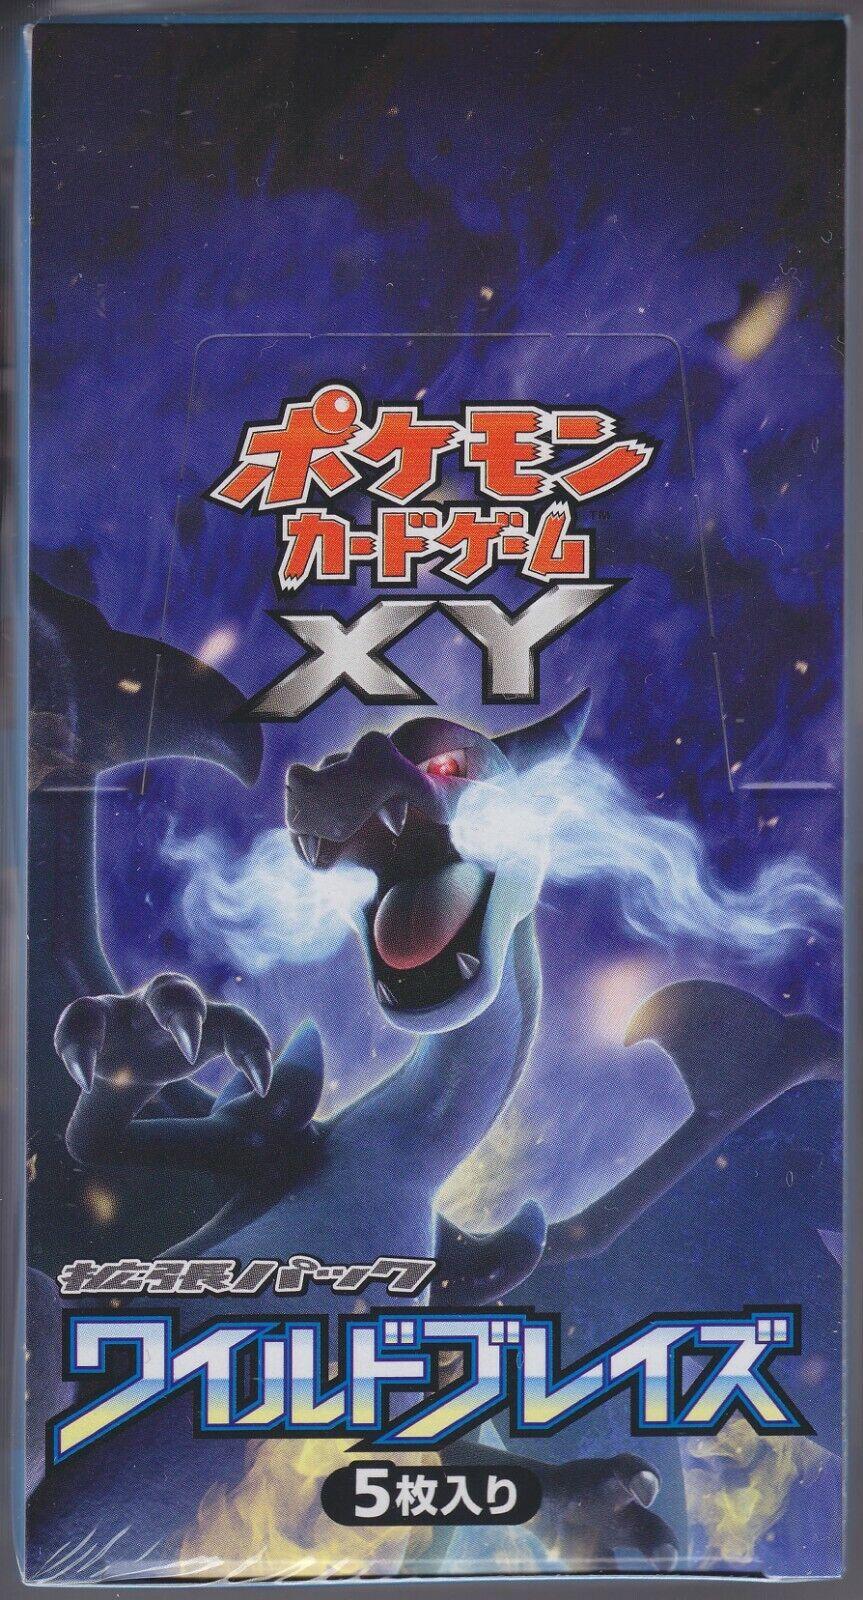 Pocket Monster karxy, parte 2, Fire Fire charger xy2, versión 1, japonés.